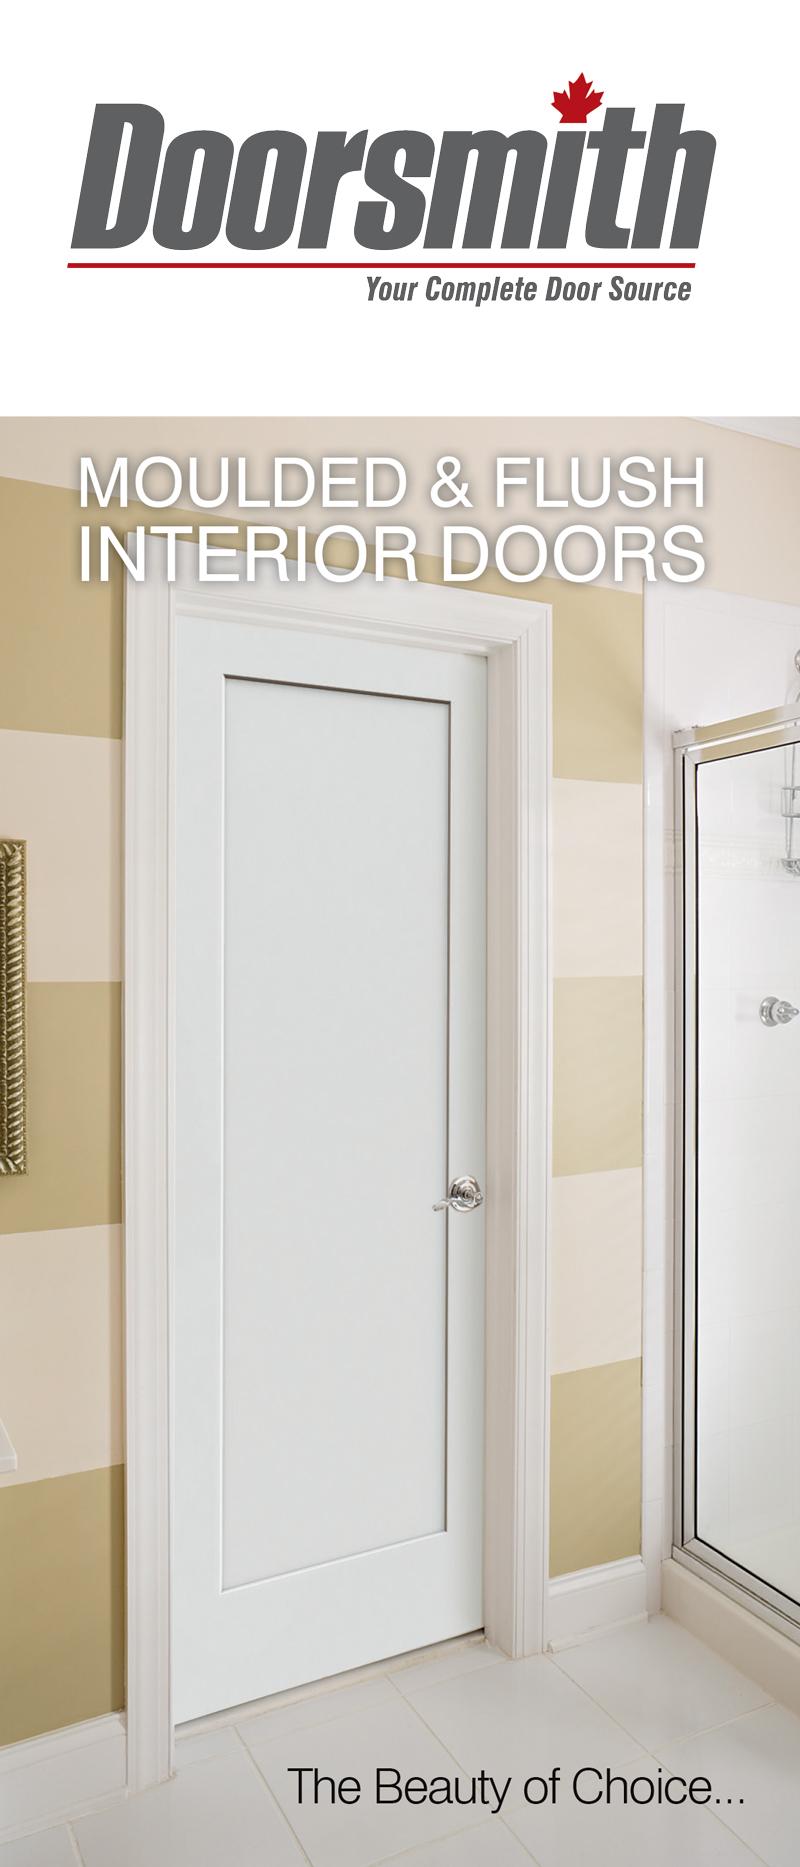 Doorsmith Interior Doors Tri Fold